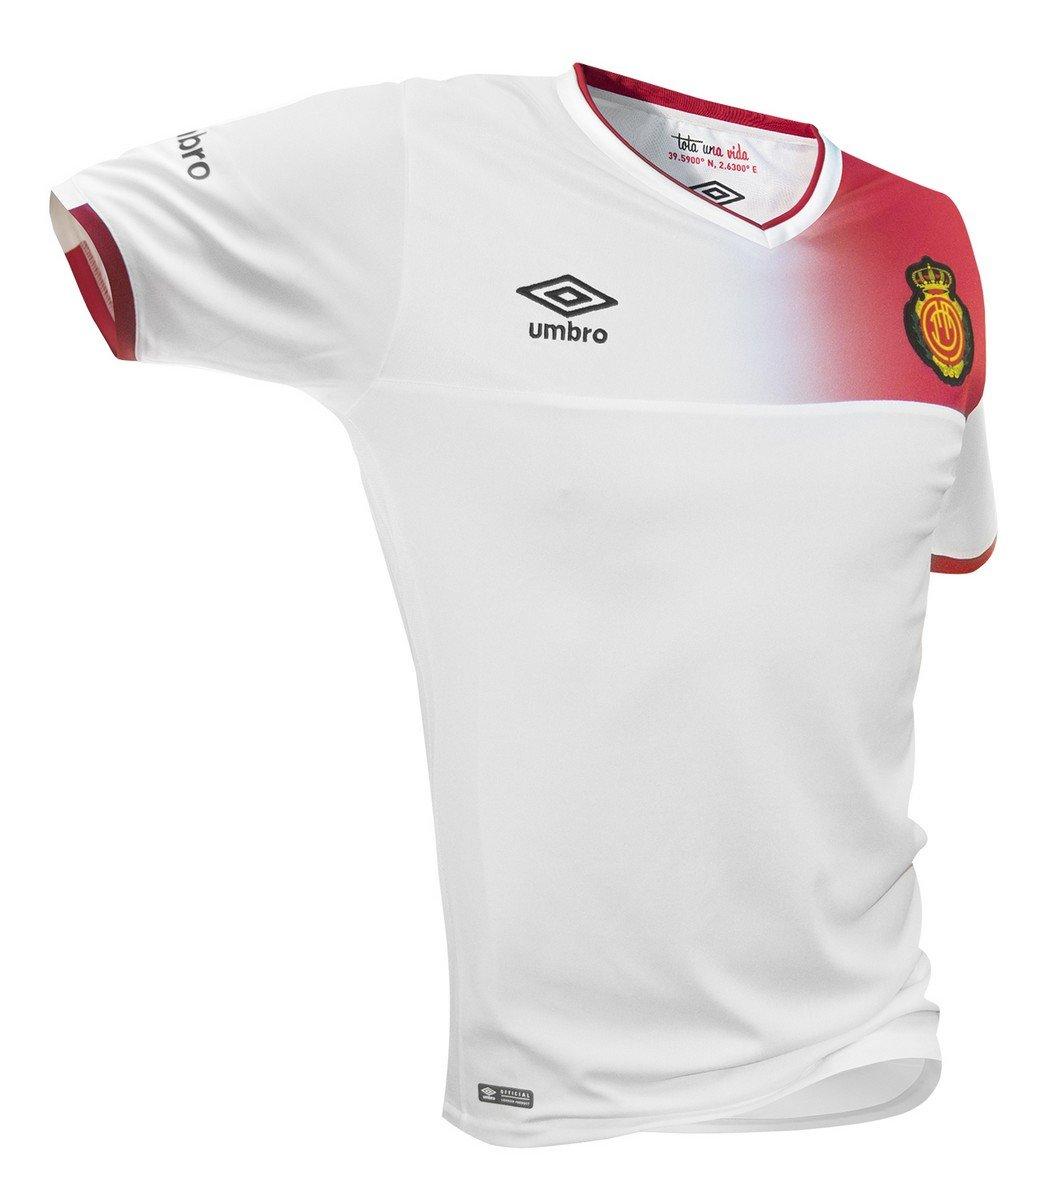 Umbro RCD Mallorca Away SS Jnr Camiseta de Fútbol Oficial, Hombre, Blanco, S: Amazon.es: Deportes y aire libre